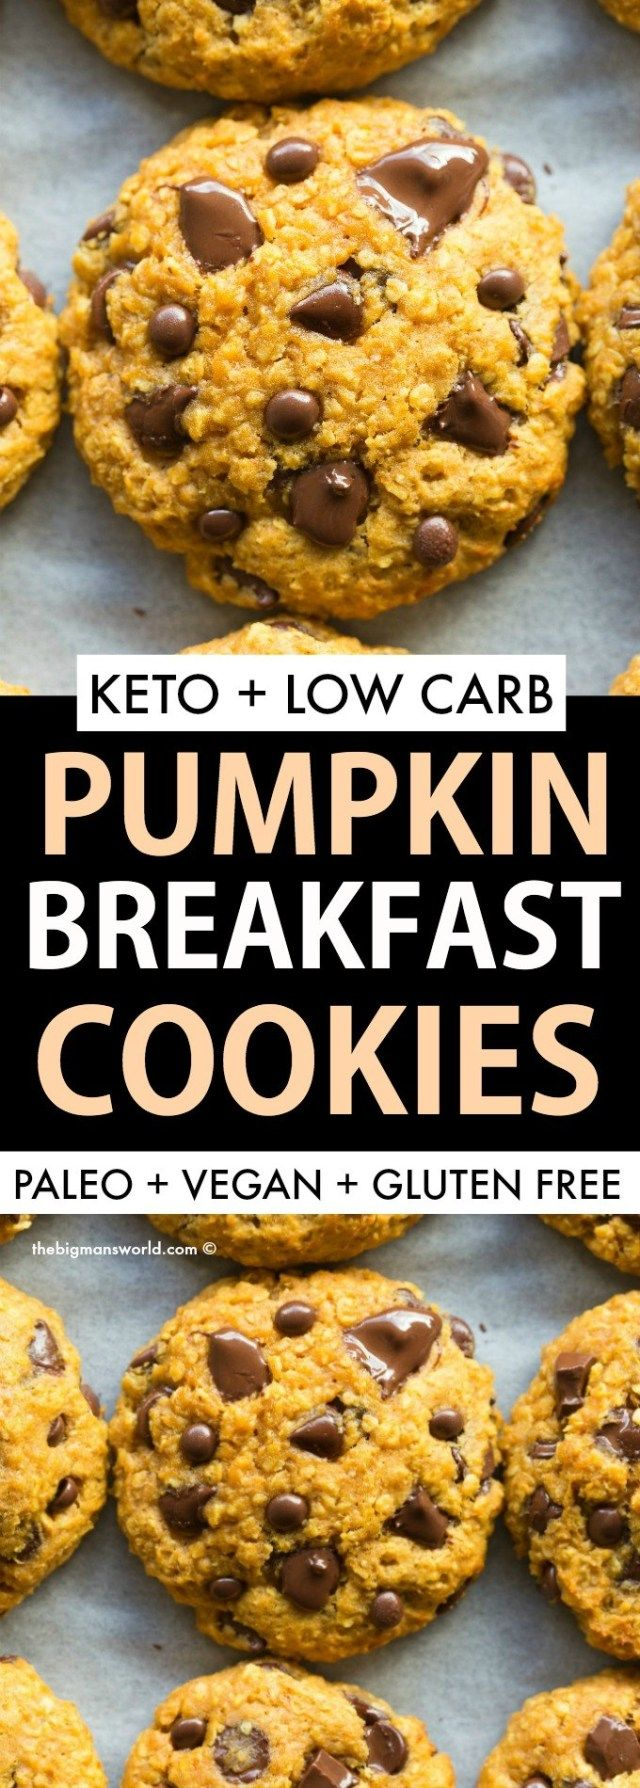 Paleo Pumpkin Breakfast Cookies Vegan Gluten Free The Big Man S World Recipe Pumpkin Breakfast Pumpkin Breakfast Cookies Breakfast Cookies